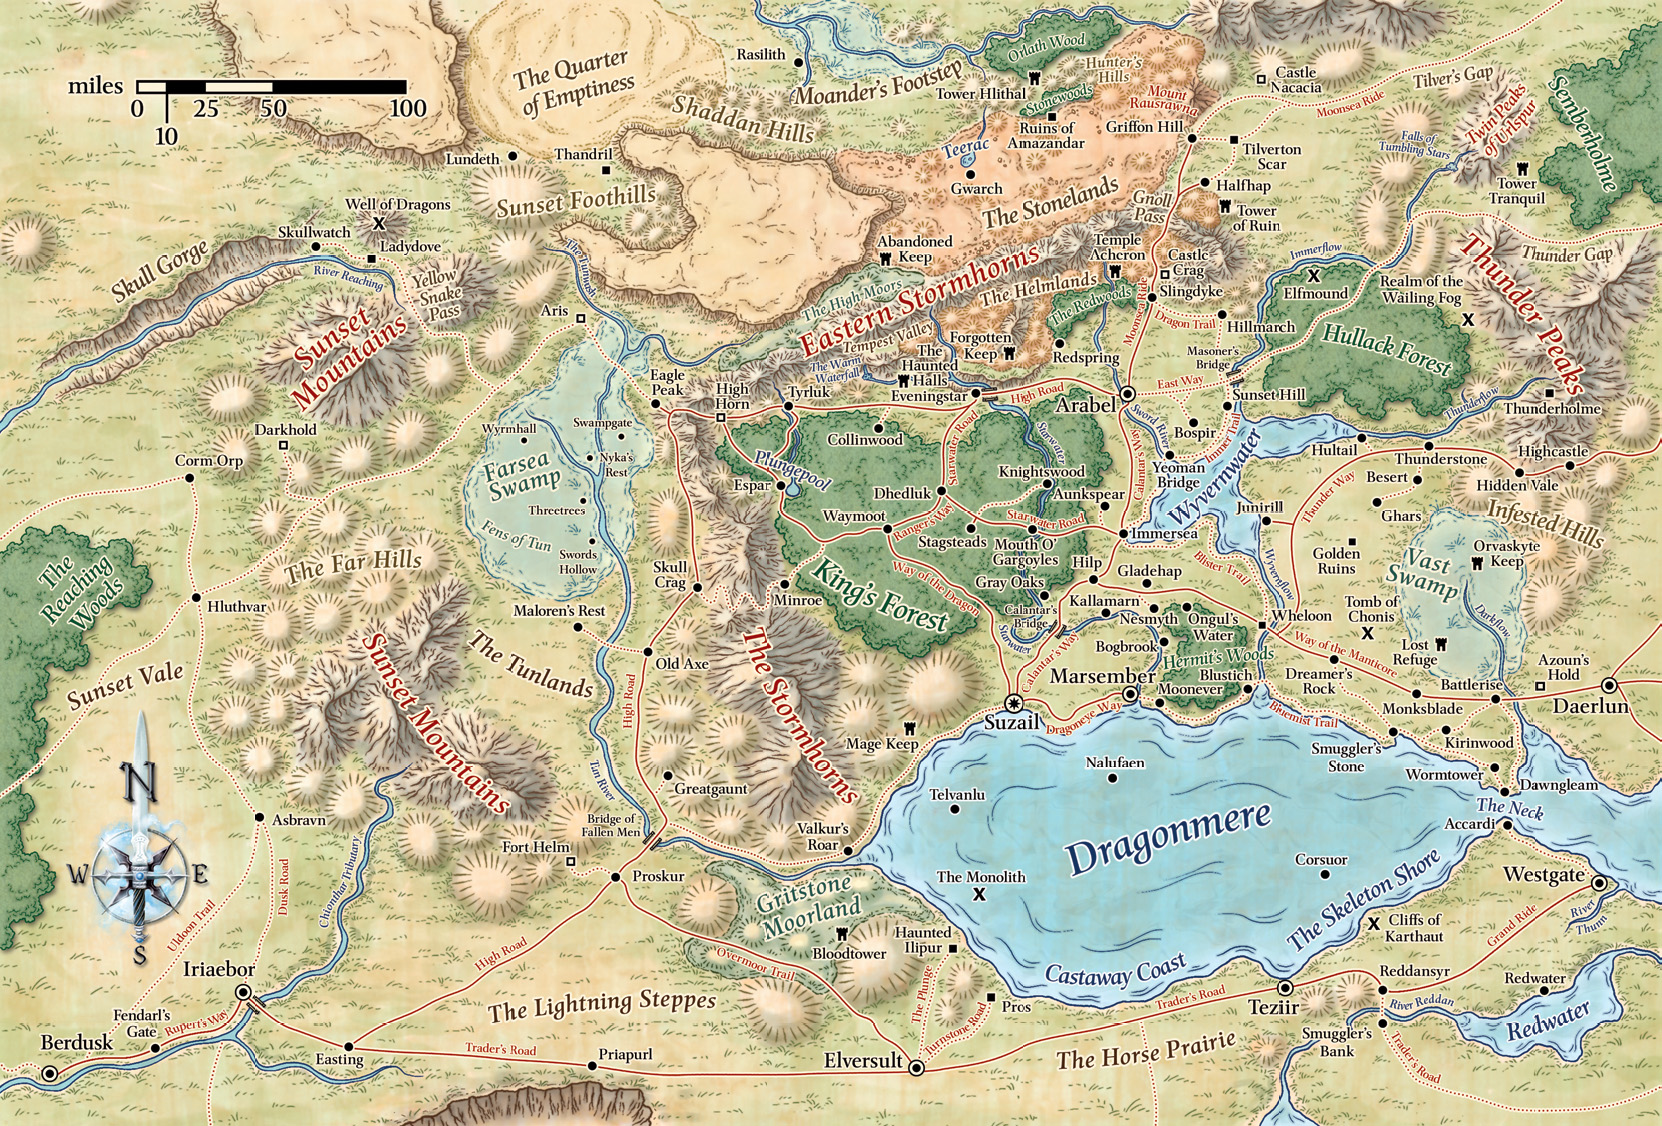 Pin Forgotten Realms Map Faerun on Pinterest